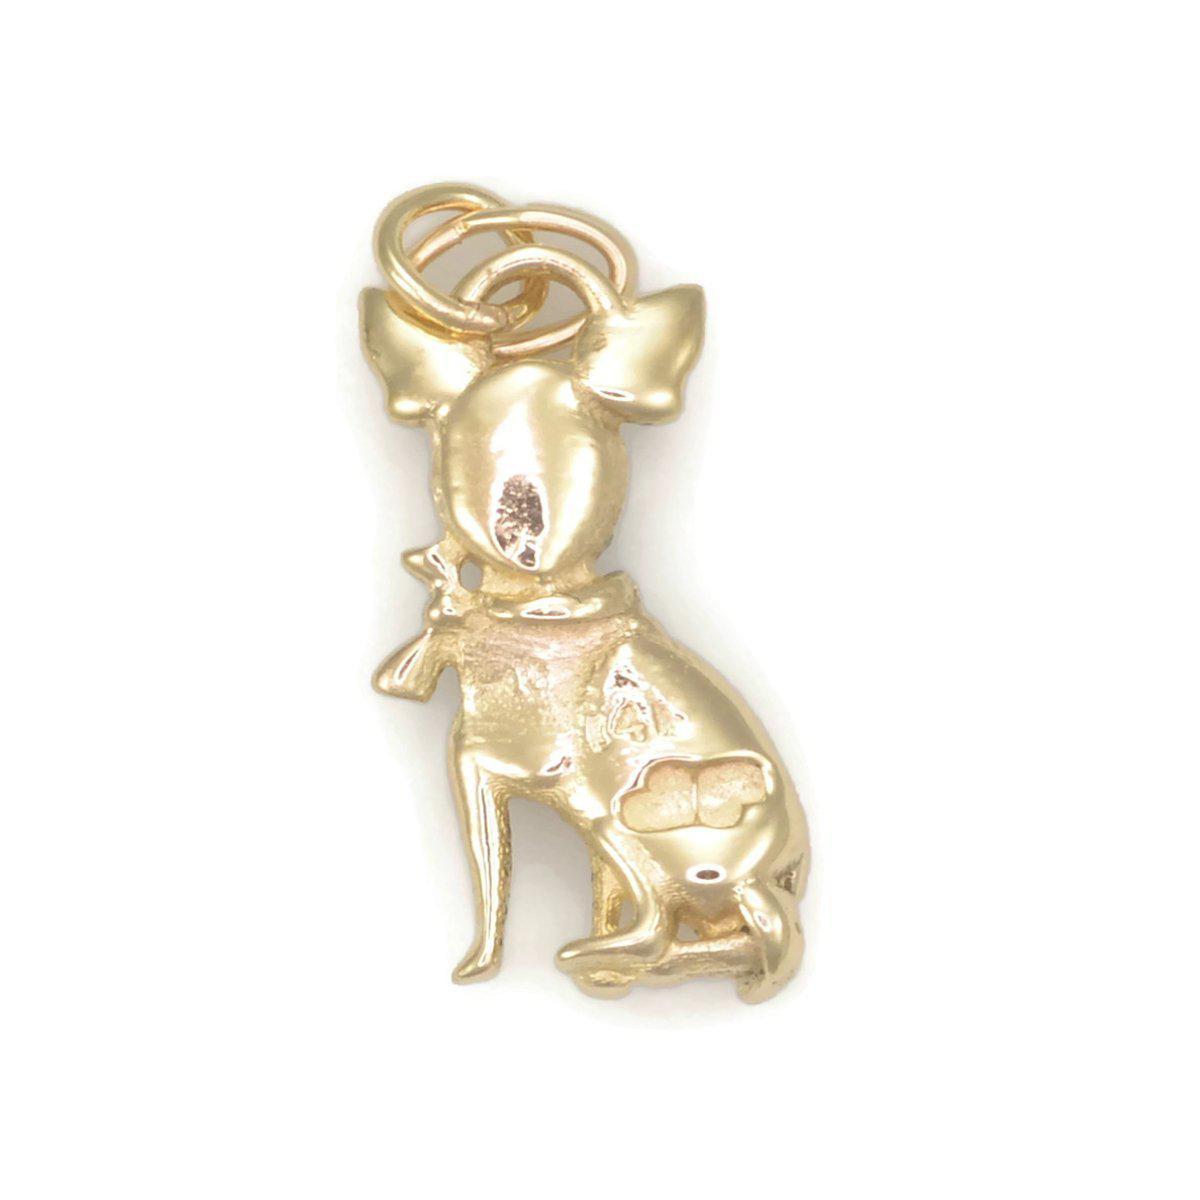 Donna Pizarro Designs 14kt Yellow Gold Chihuahua Charm hUMYsj